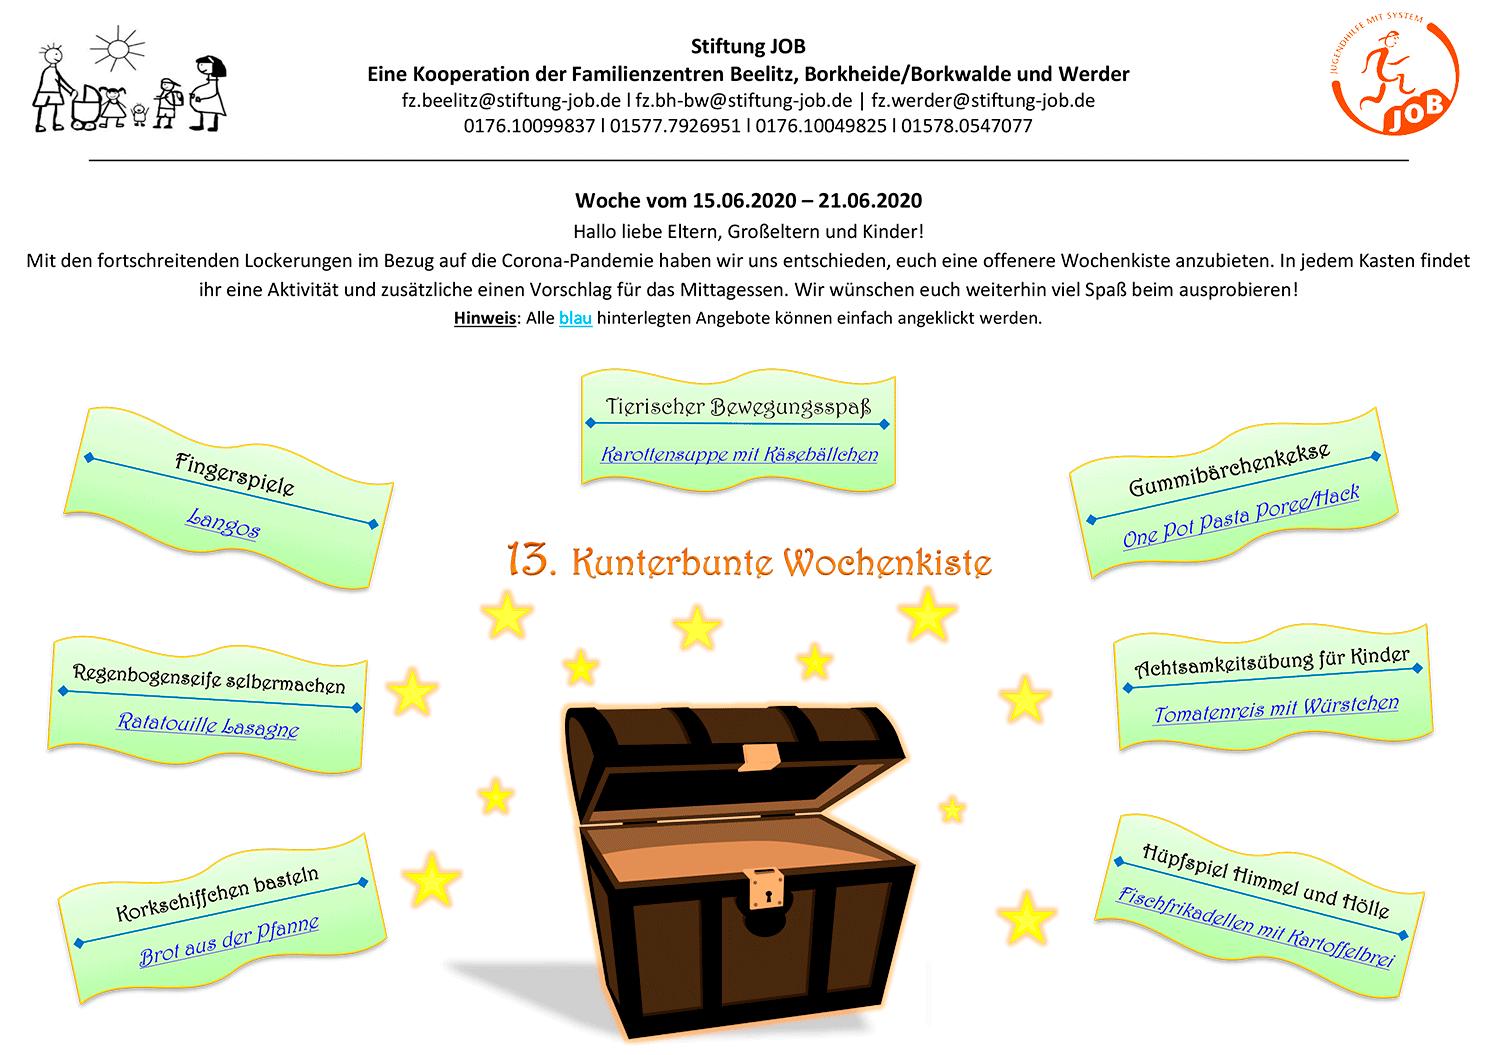 Kunterbunte-Wochenkiste-13